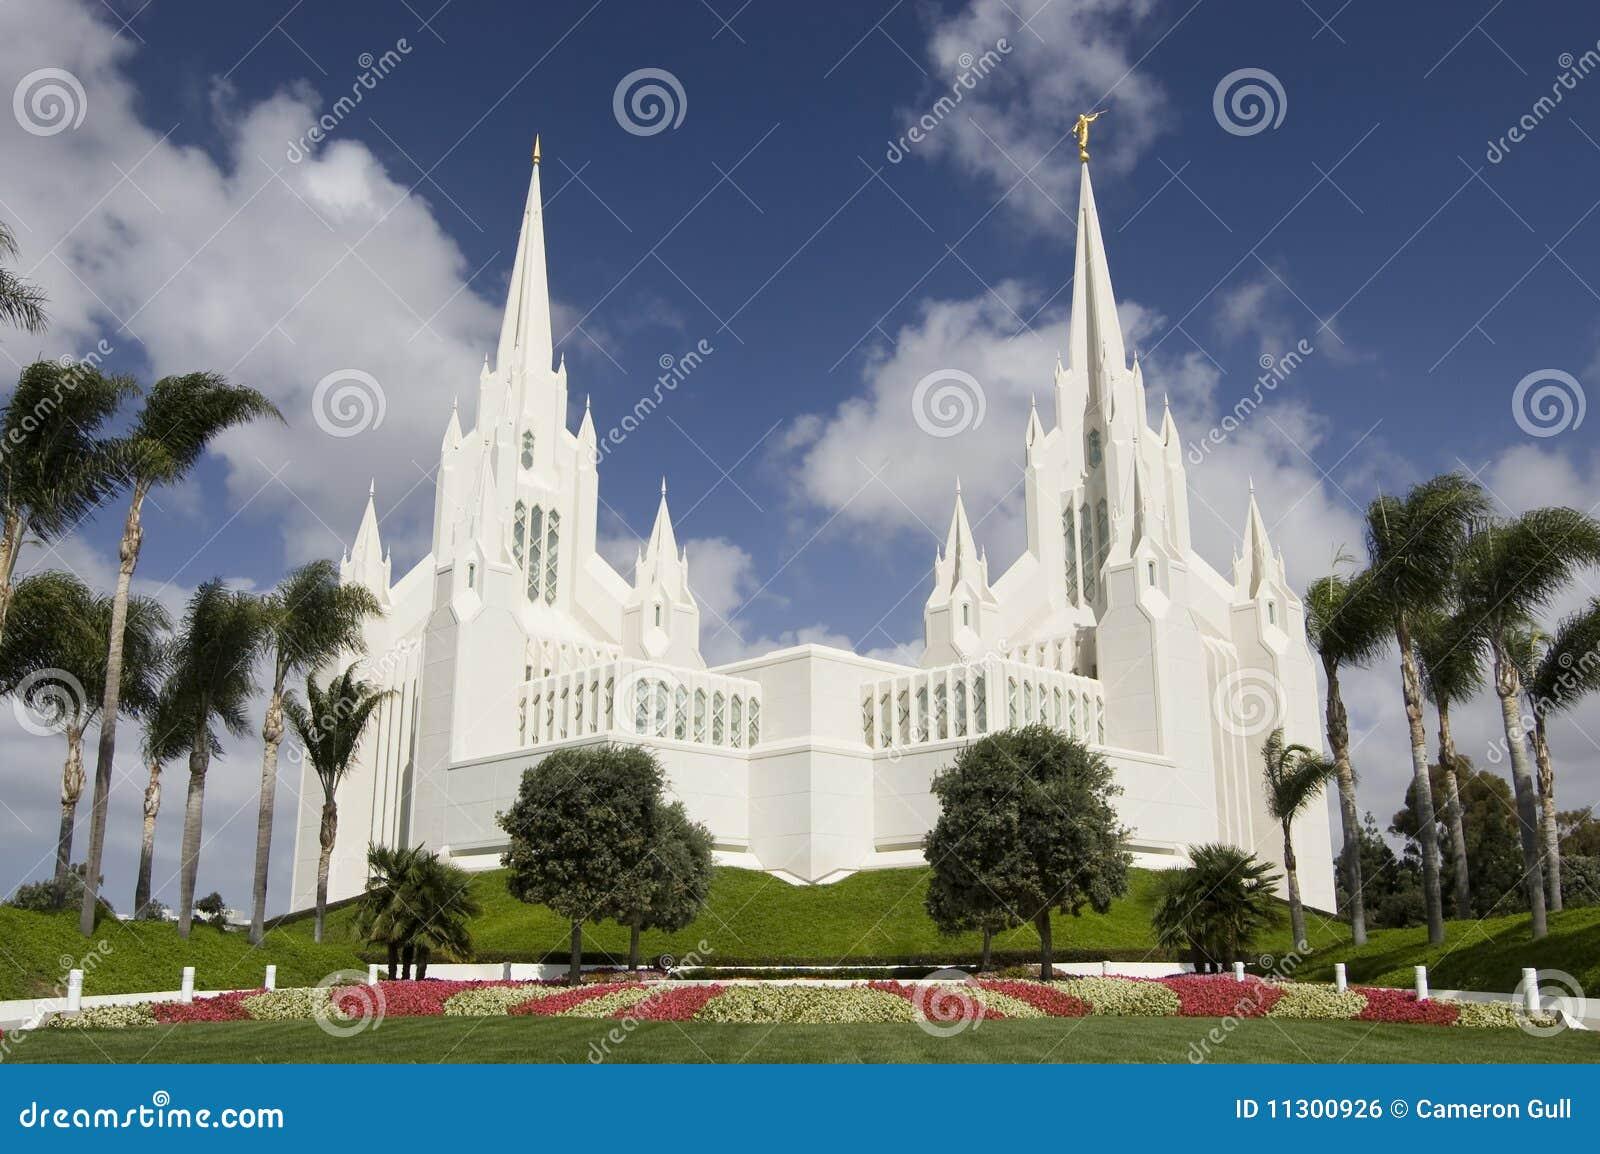 Mormon Temple - San Diego, California